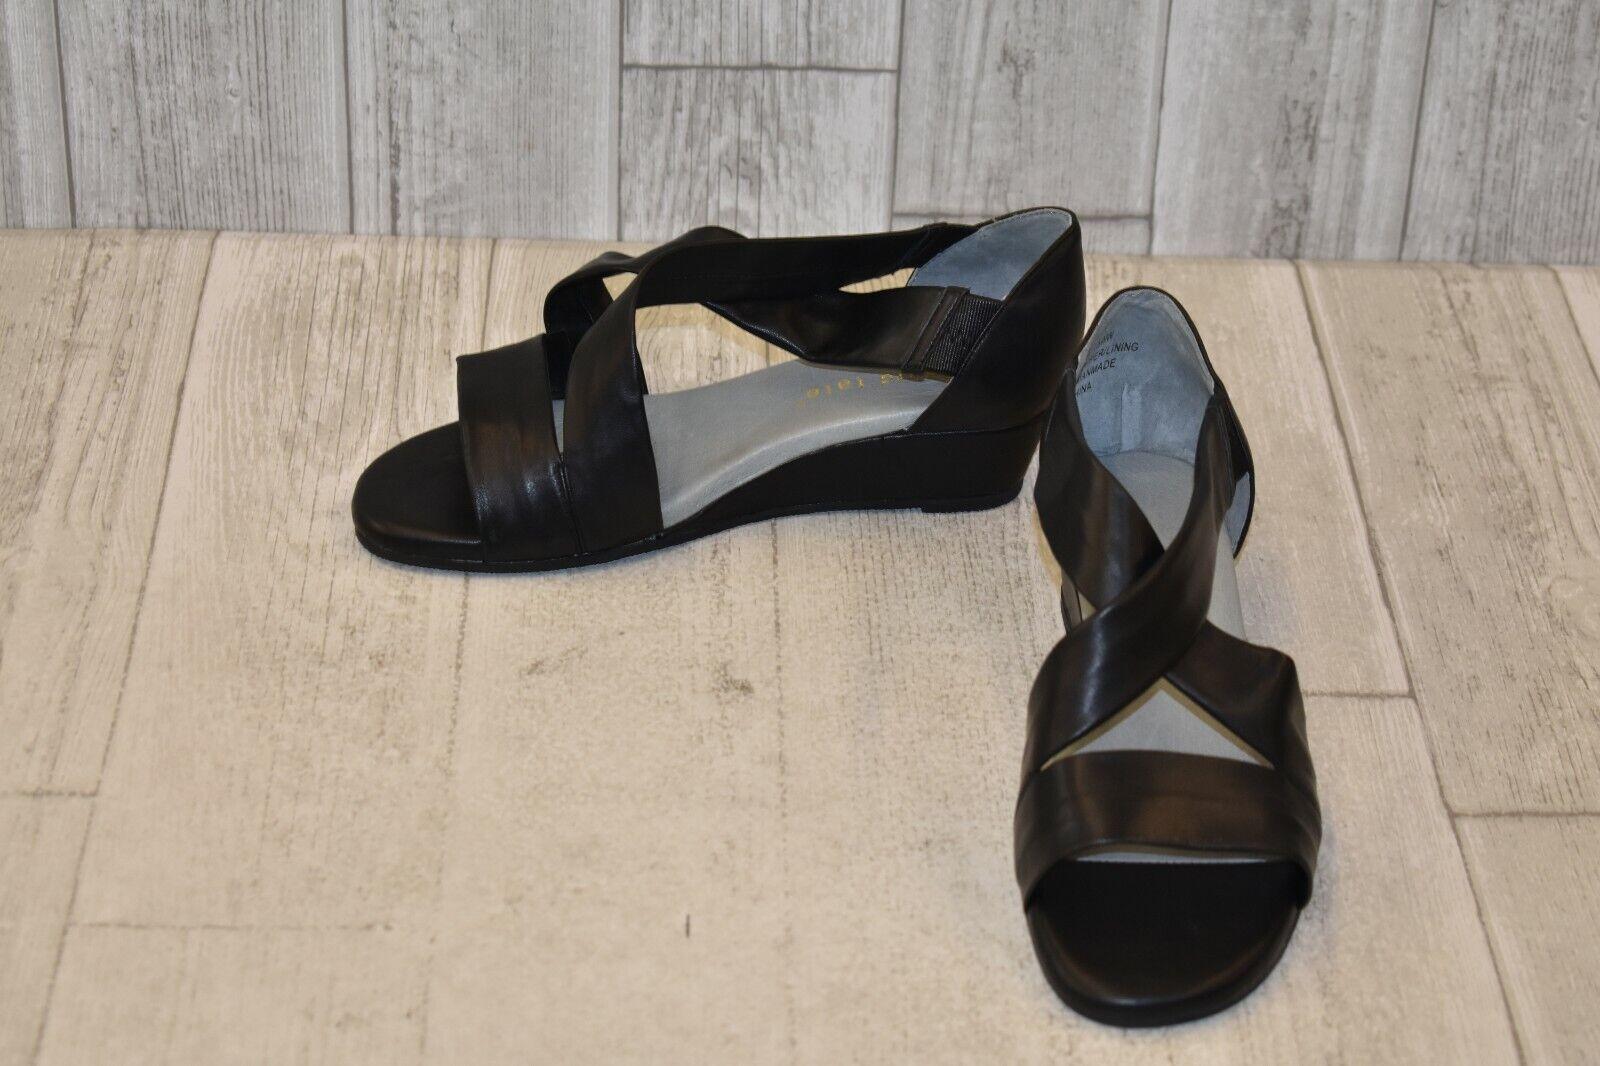 David Tate Swell Cross Strap Wedge Sandal - Women's Size 7.5 WW - Black